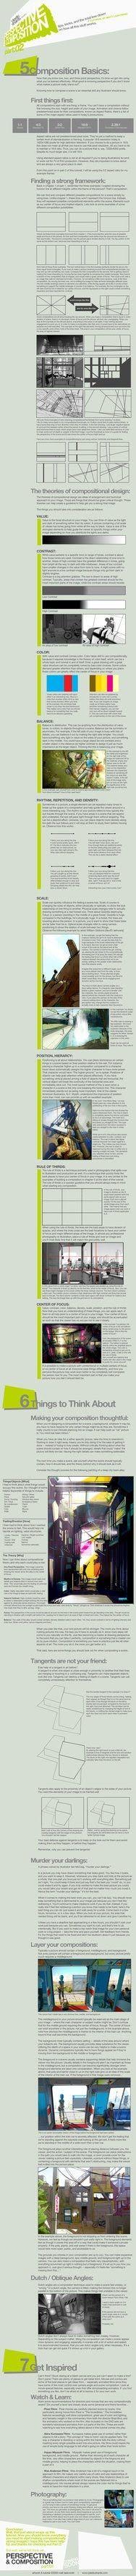 AP Instructional resources - Visual Arts